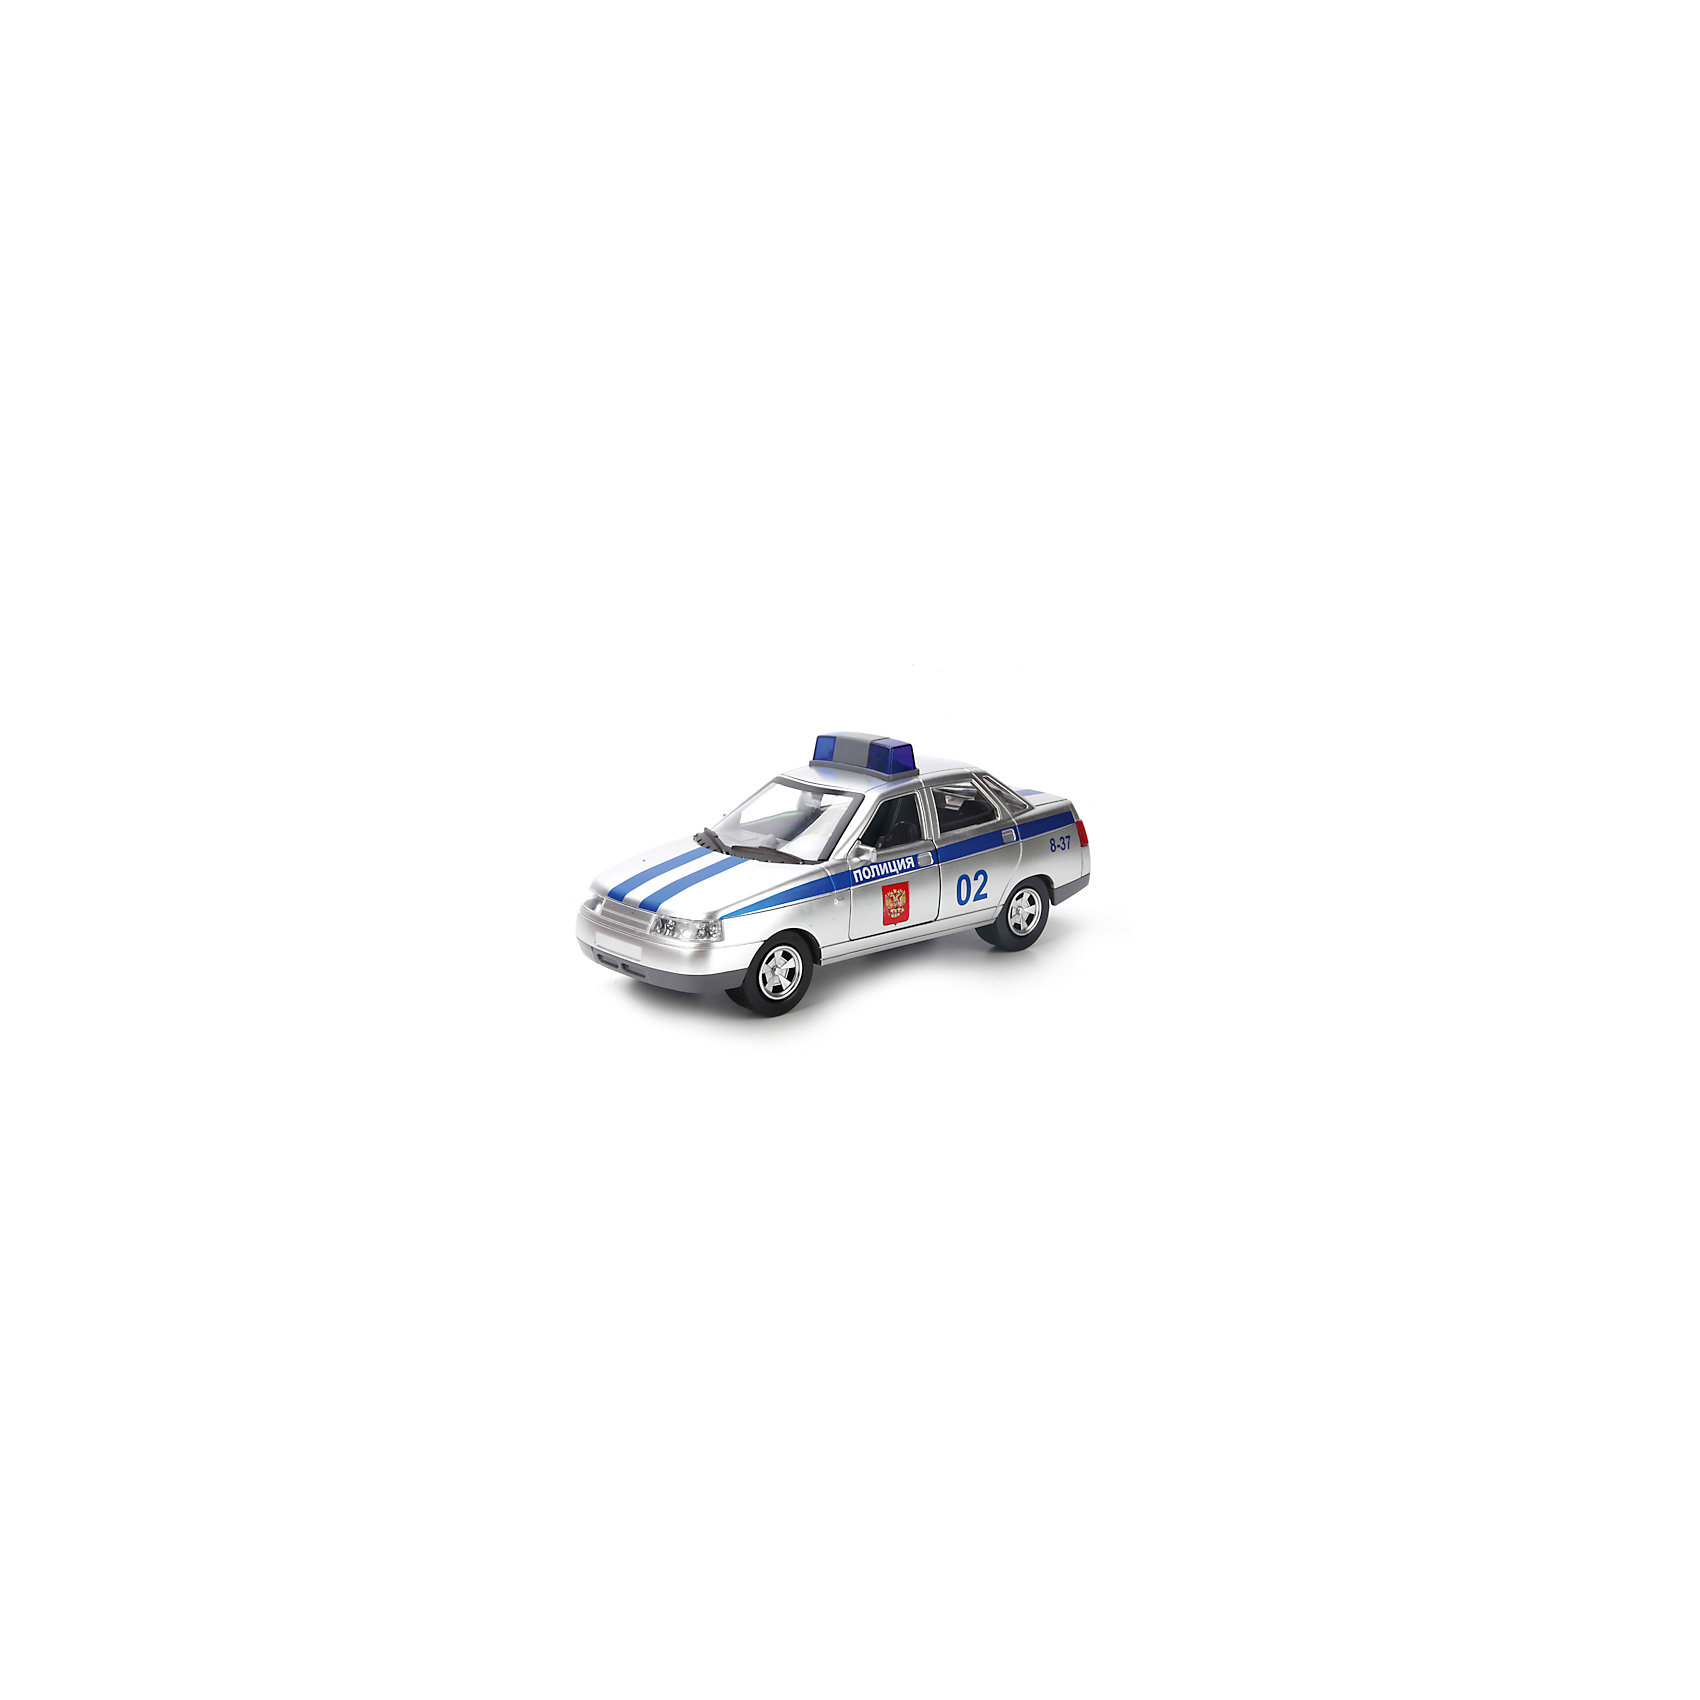 Машина LADA 110, со светом и звуком, ТЕХНОПАРКМашинки<br>Машина Технопарк инерционная LADA 110, со светом и звуком.<br><br>Ширина мм: 100<br>Глубина мм: 130<br>Высота мм: 260<br>Вес г: 410<br>Возраст от месяцев: 36<br>Возраст до месяцев: 84<br>Пол: Мужской<br>Возраст: Детский<br>SKU: 5420382